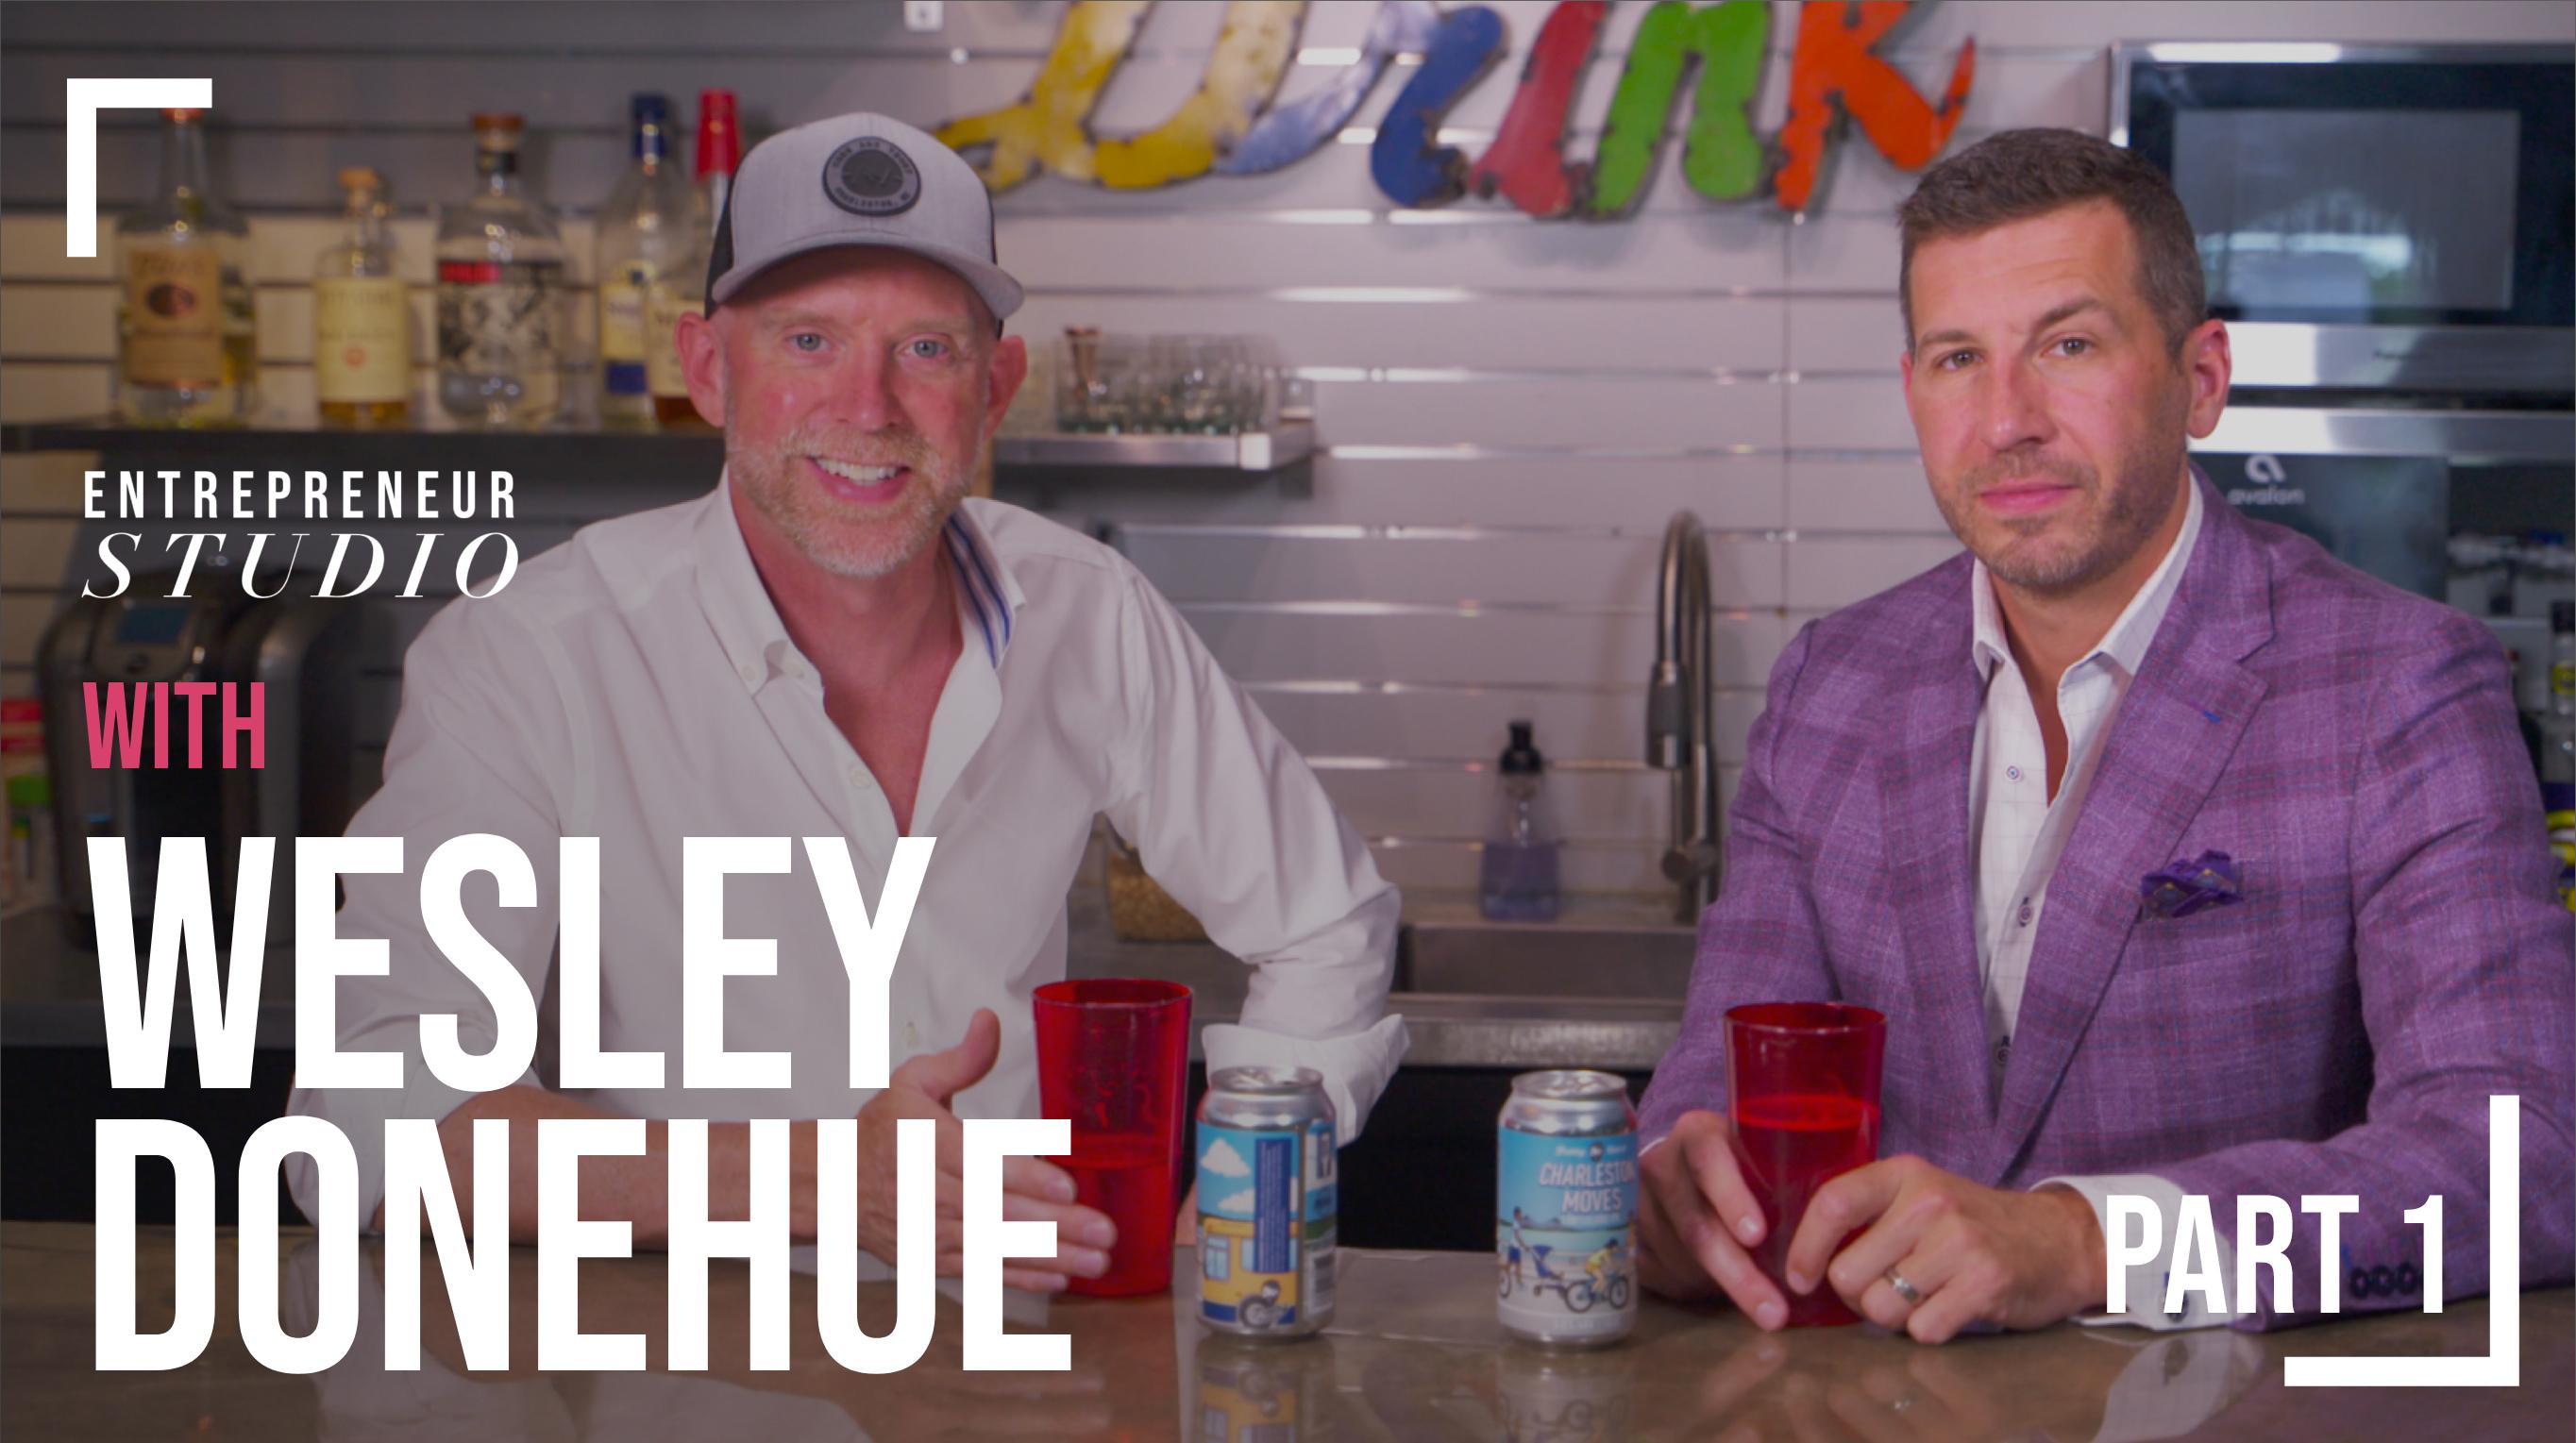 Entrepreneur Studio Series - Episode 2 - Landing the Big Fish with Wesley Donehue